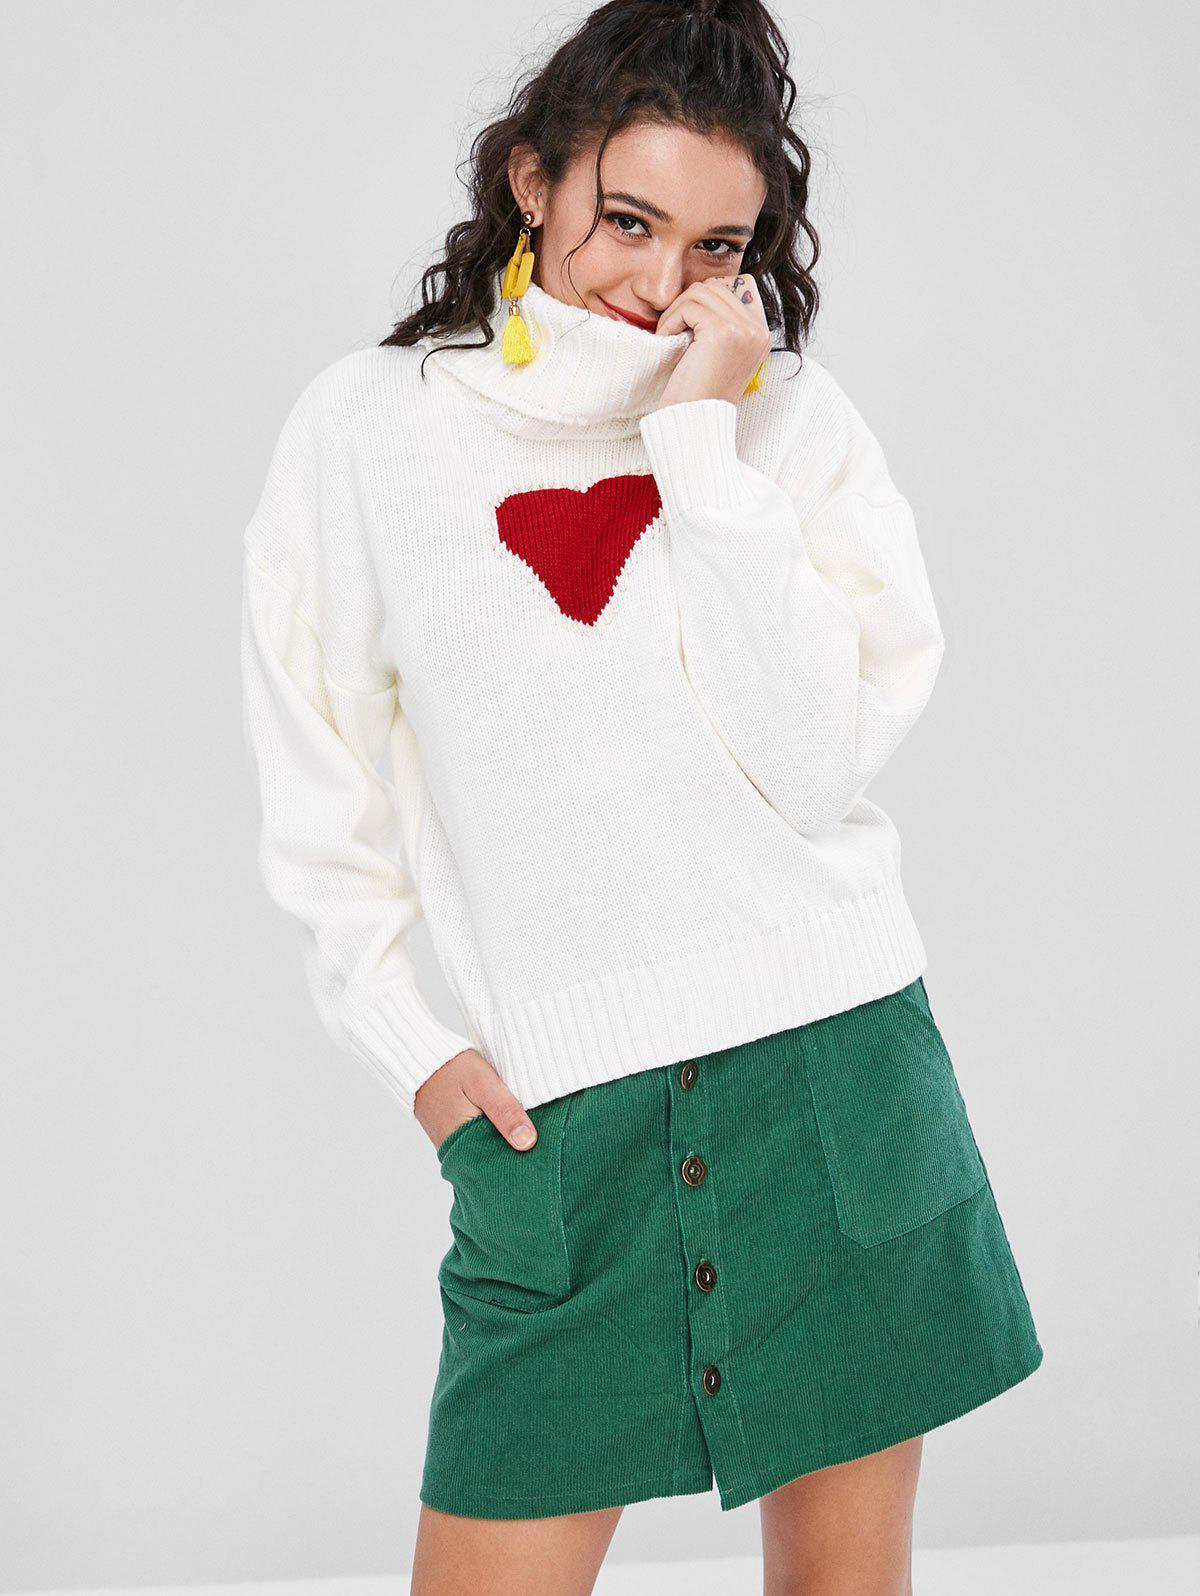 Heart Faux Pearls Sweater